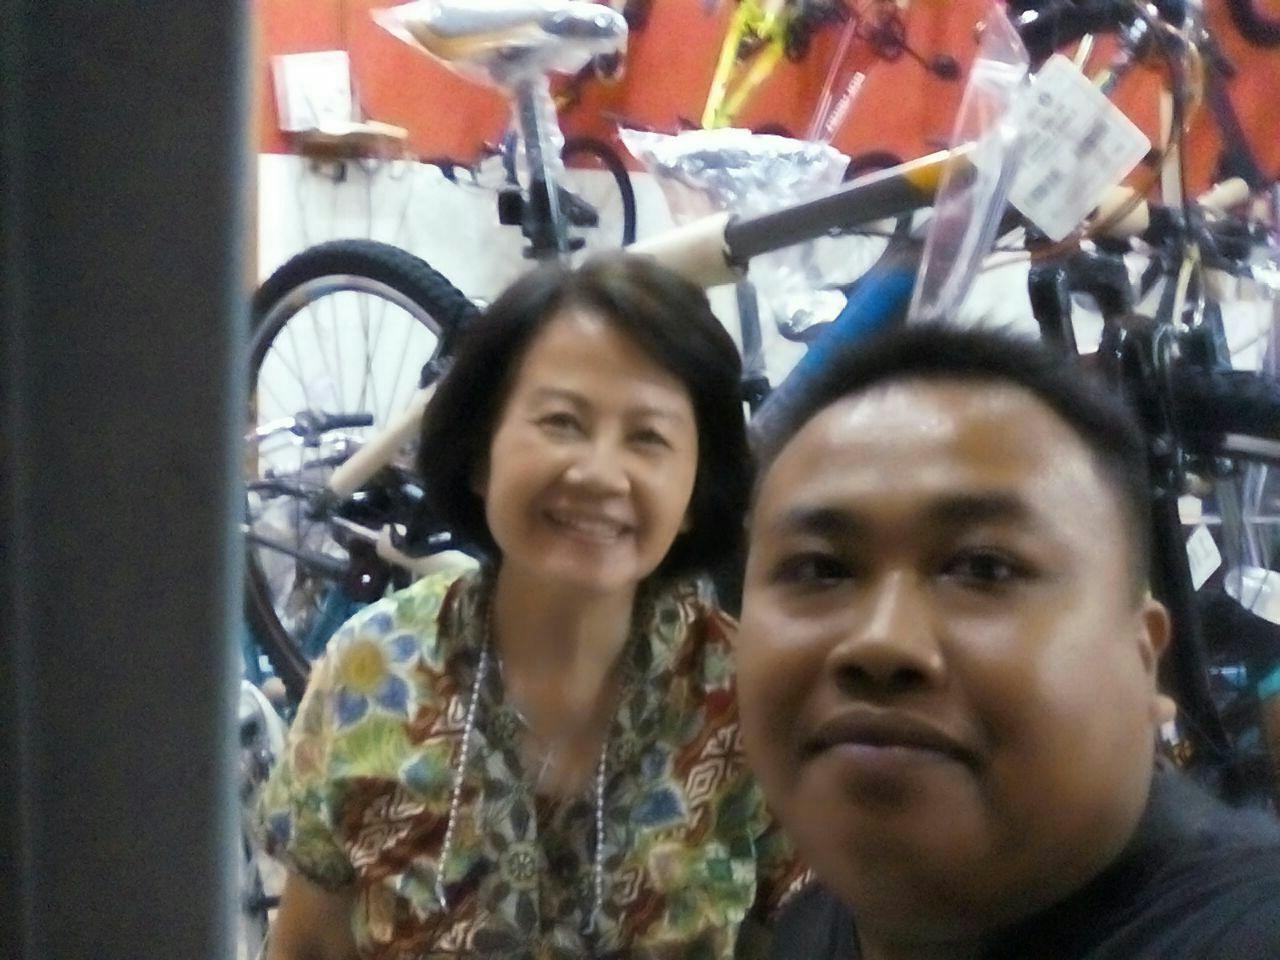 Bingung Memilih Sepeda Pilih Saja Polygon Cascade 2didik Jatmiko 4 Selfie Bareng Ibu Melwati Pemilik Toko Ramayana Cepu